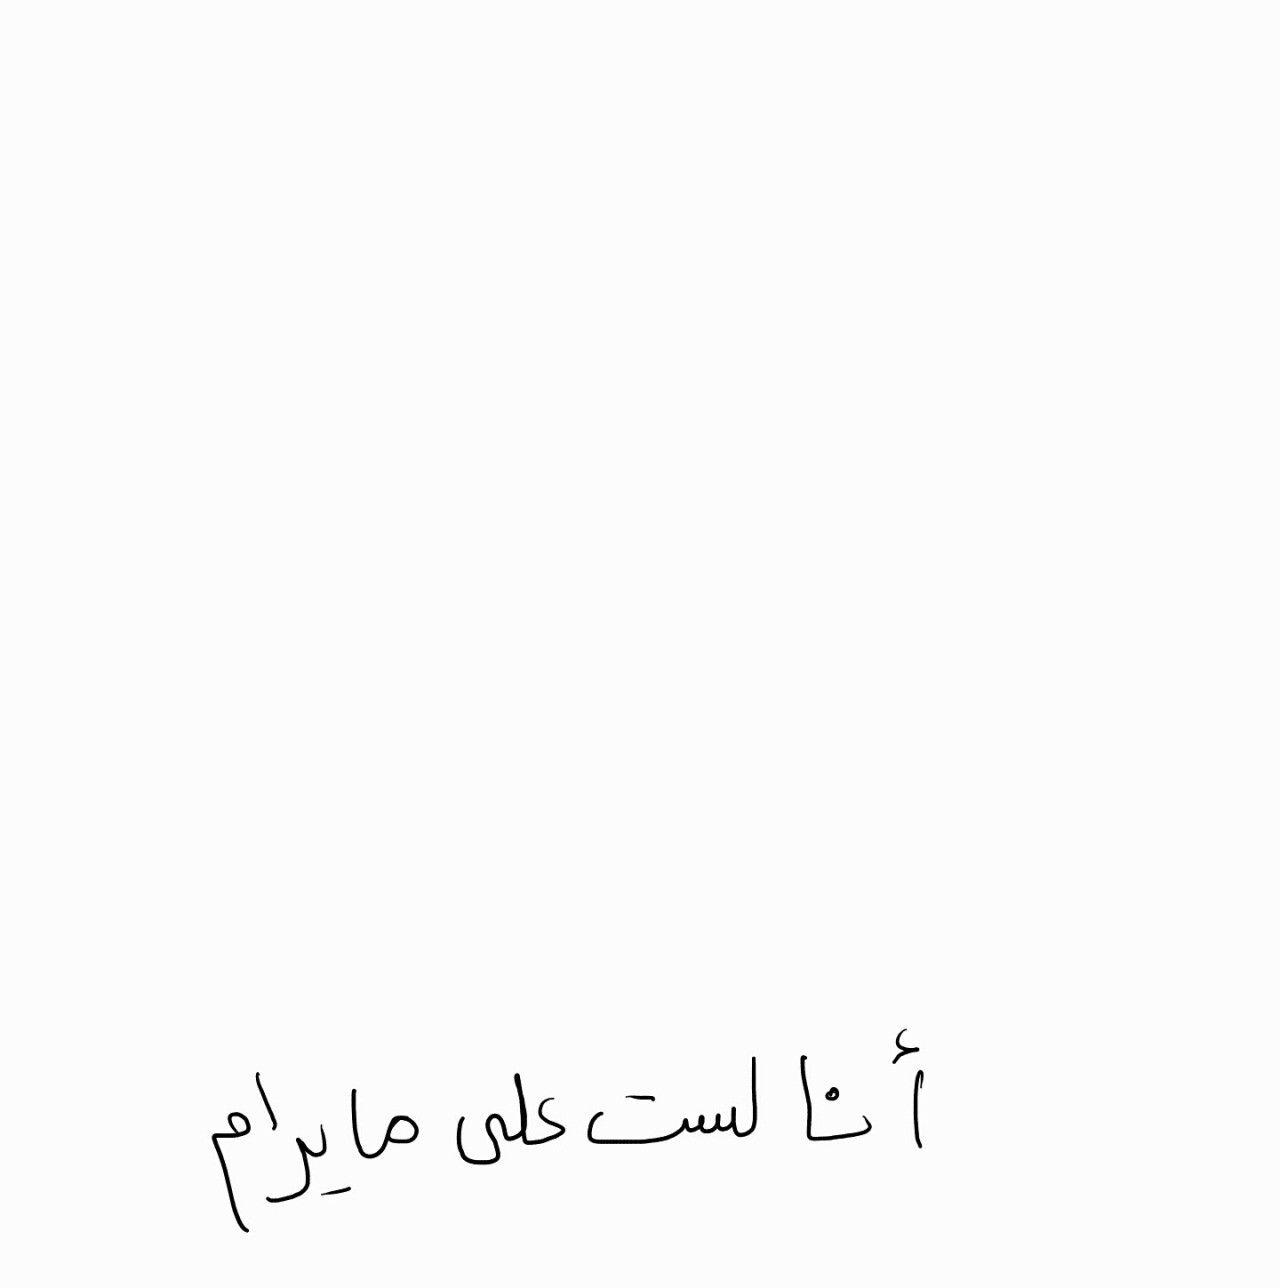 انا لست علي مايرام Quotations Arabic Words Quotes